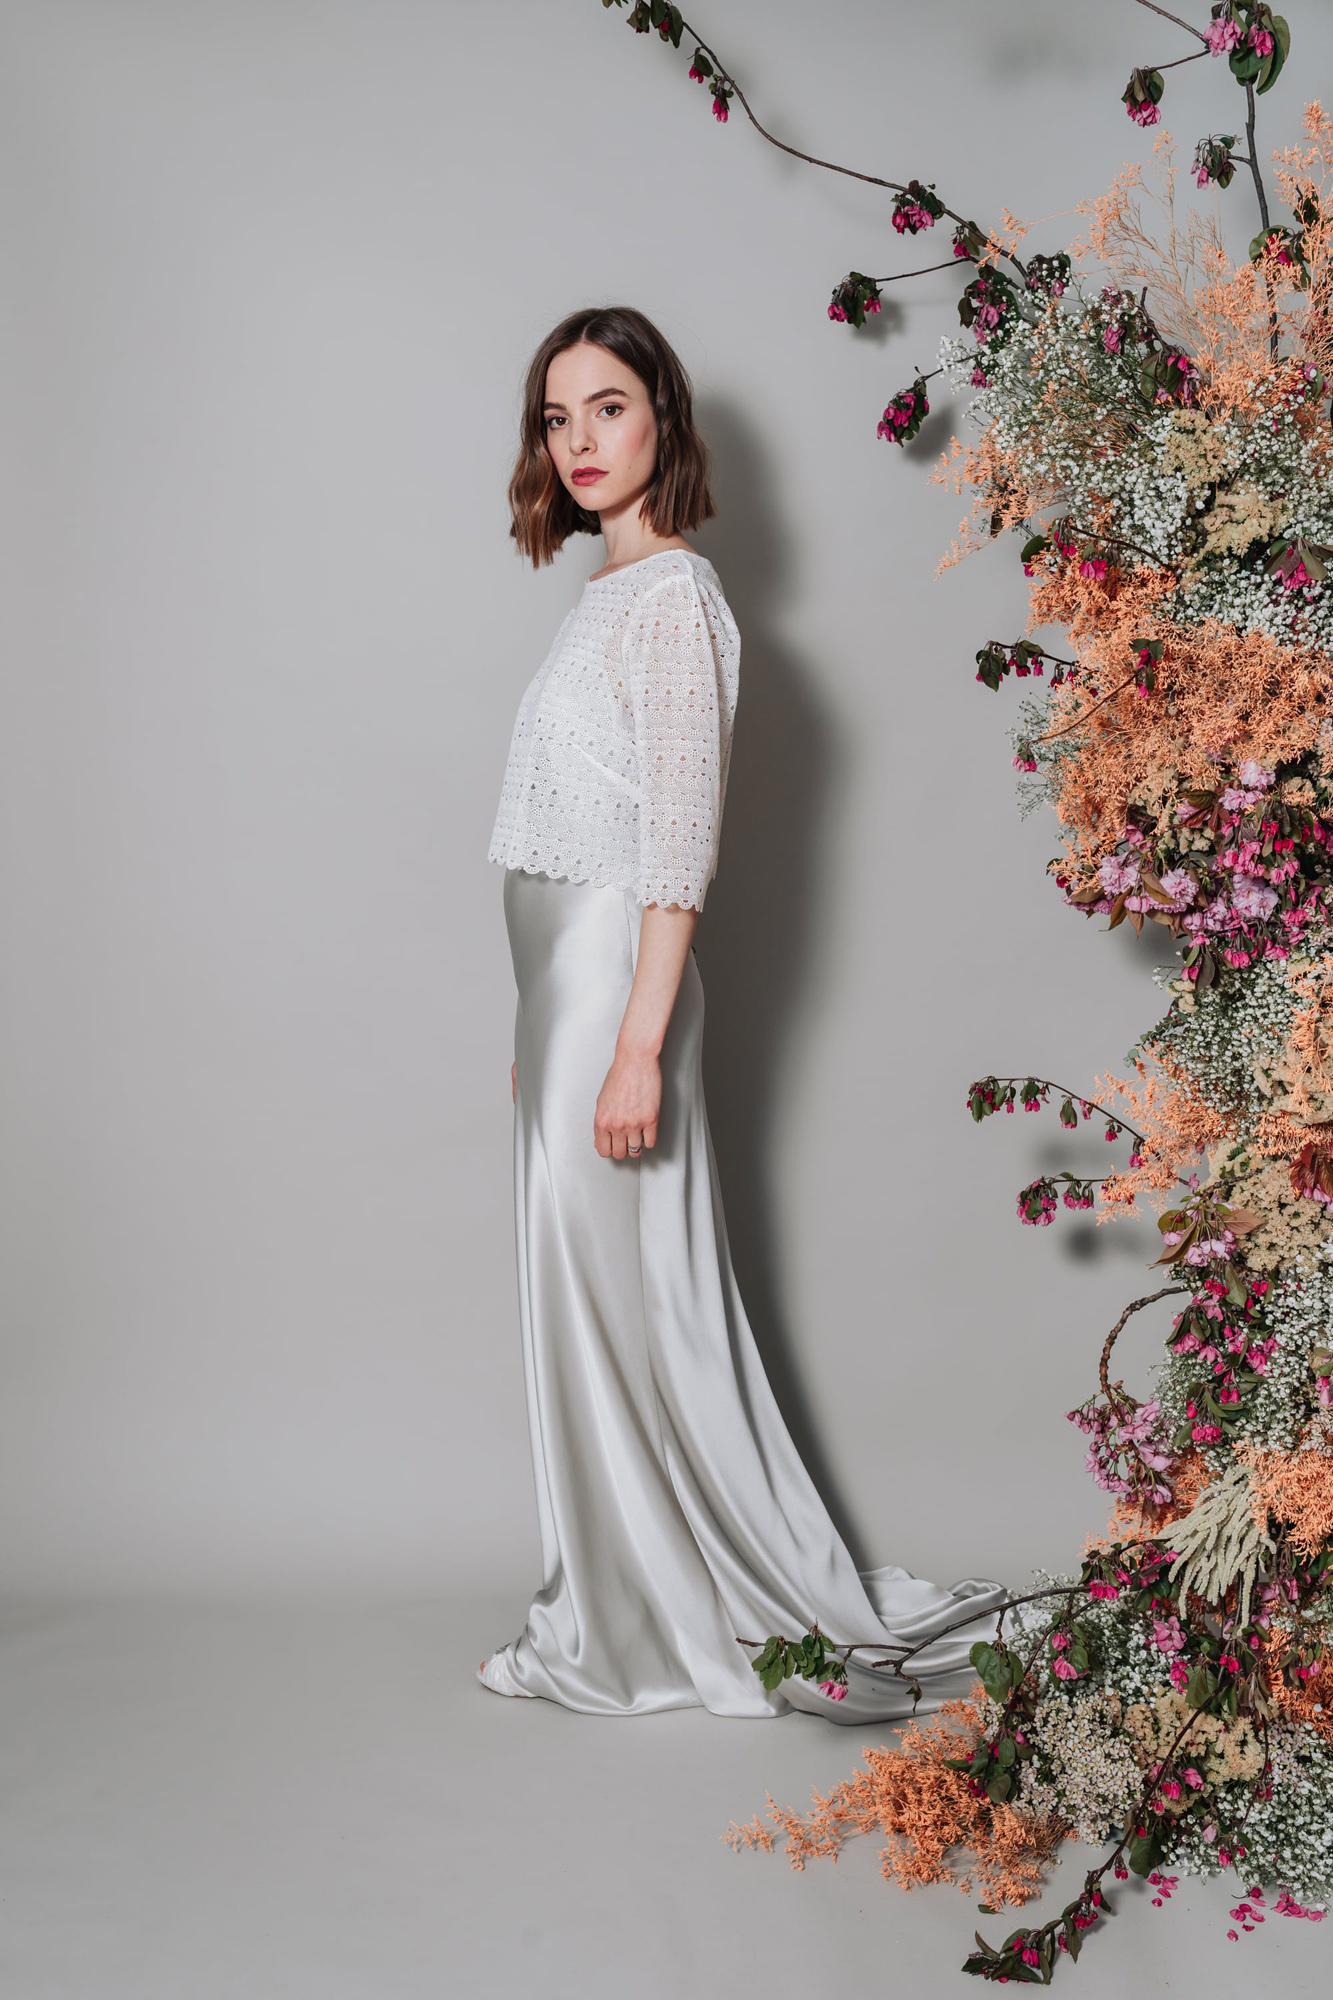 Kate-Beaumont-Sheffield-Freesia-Guipure-Lace-Jacket-Cosmos-Bias-Cut-Silver-Silk-Wedding-Gown-5.jpg